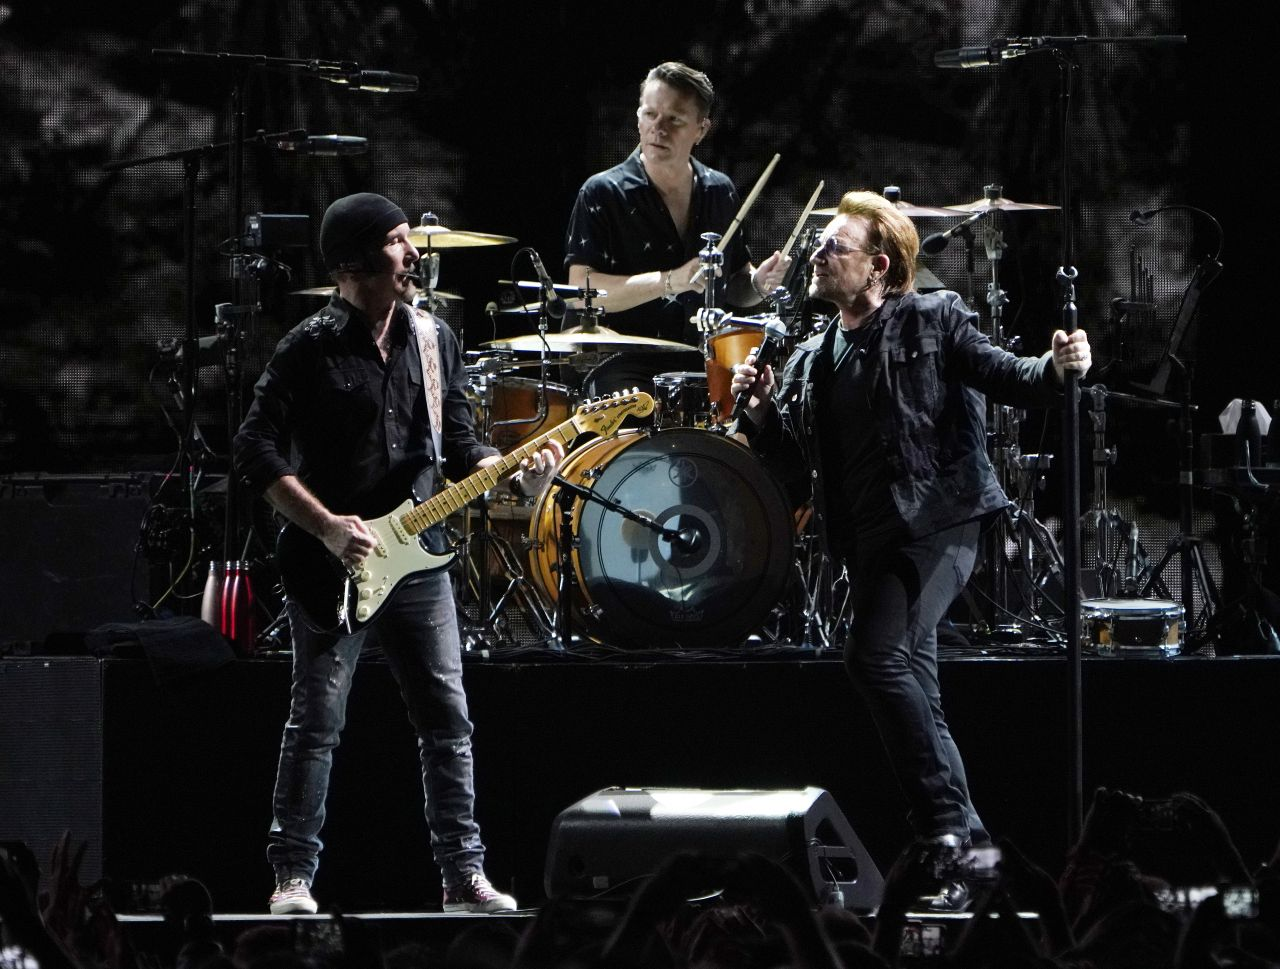 U2 um Frontmann Bono in Aktion